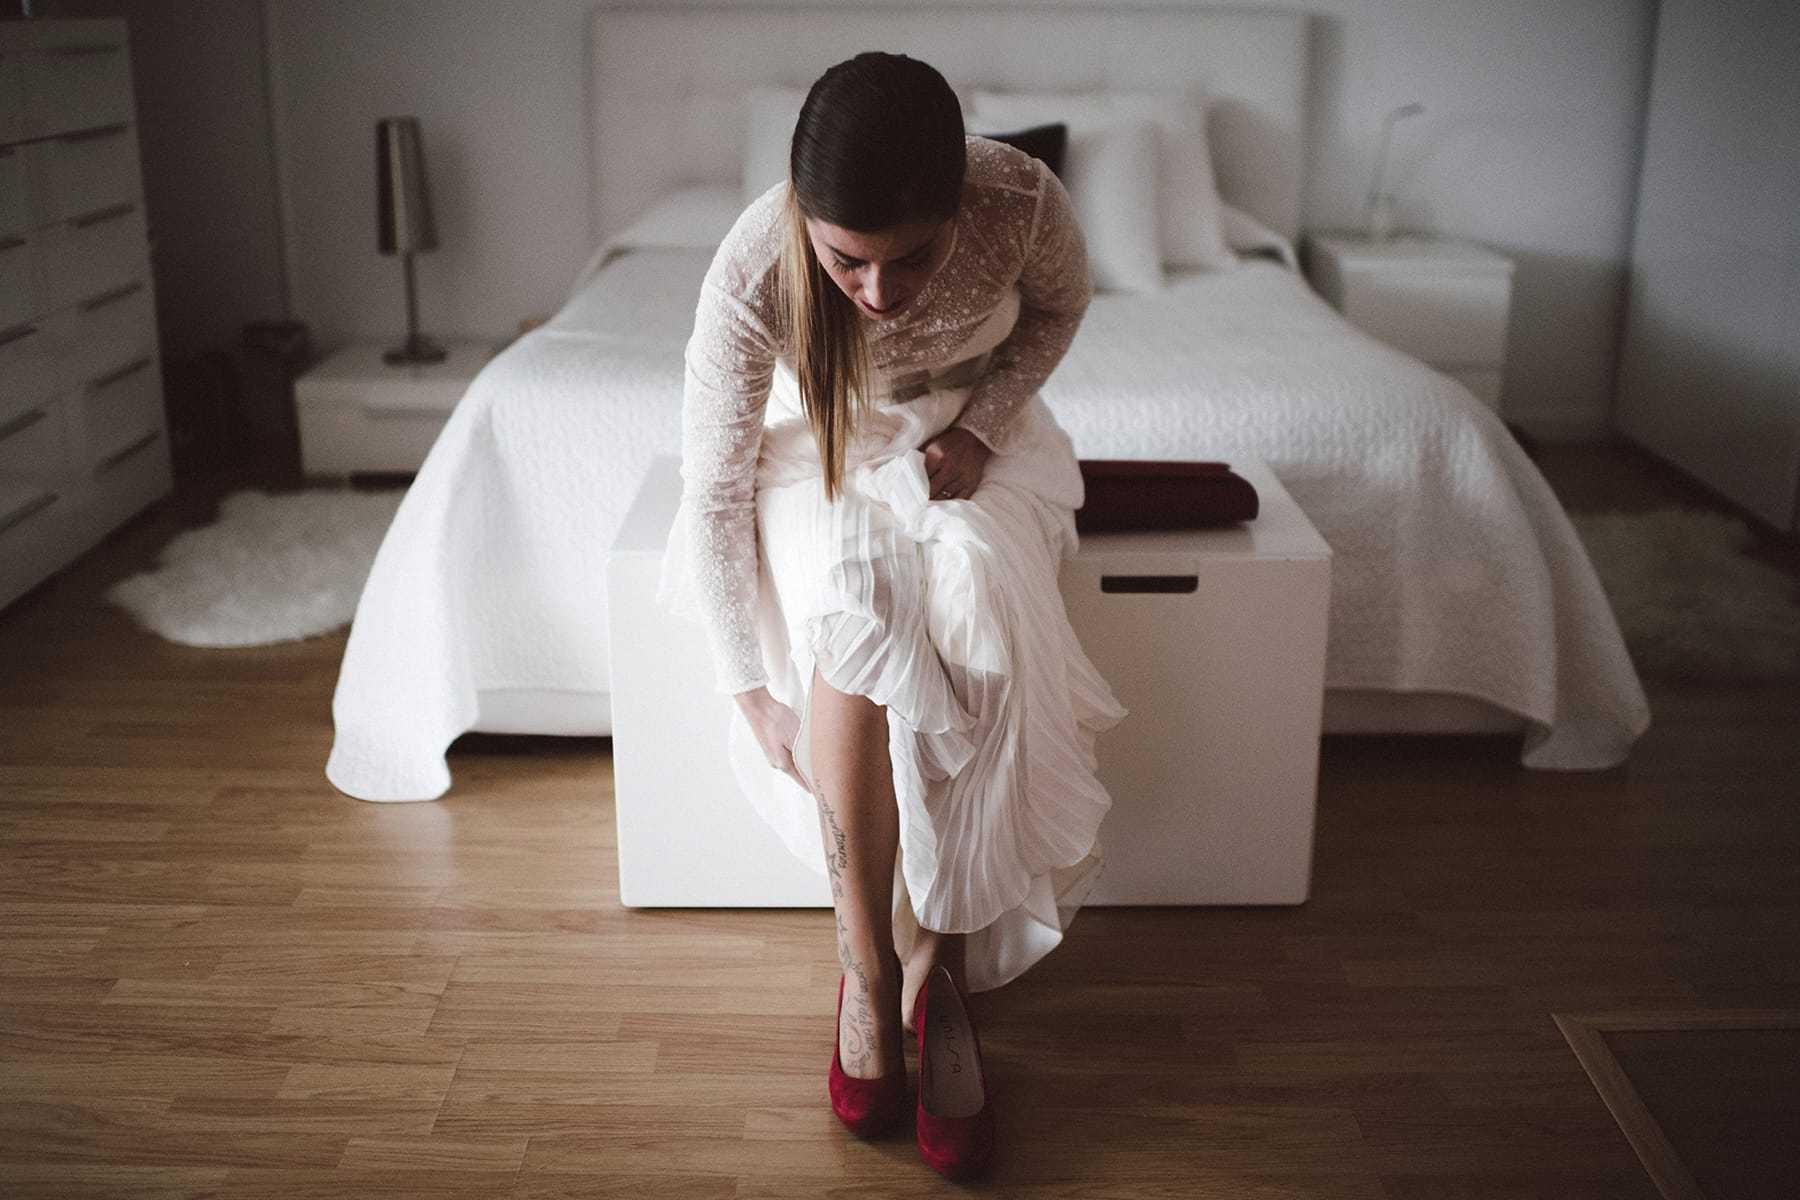 vestido_de_novia_otaduy_hilario_sanchez_fotografo_boda_barcelona_031